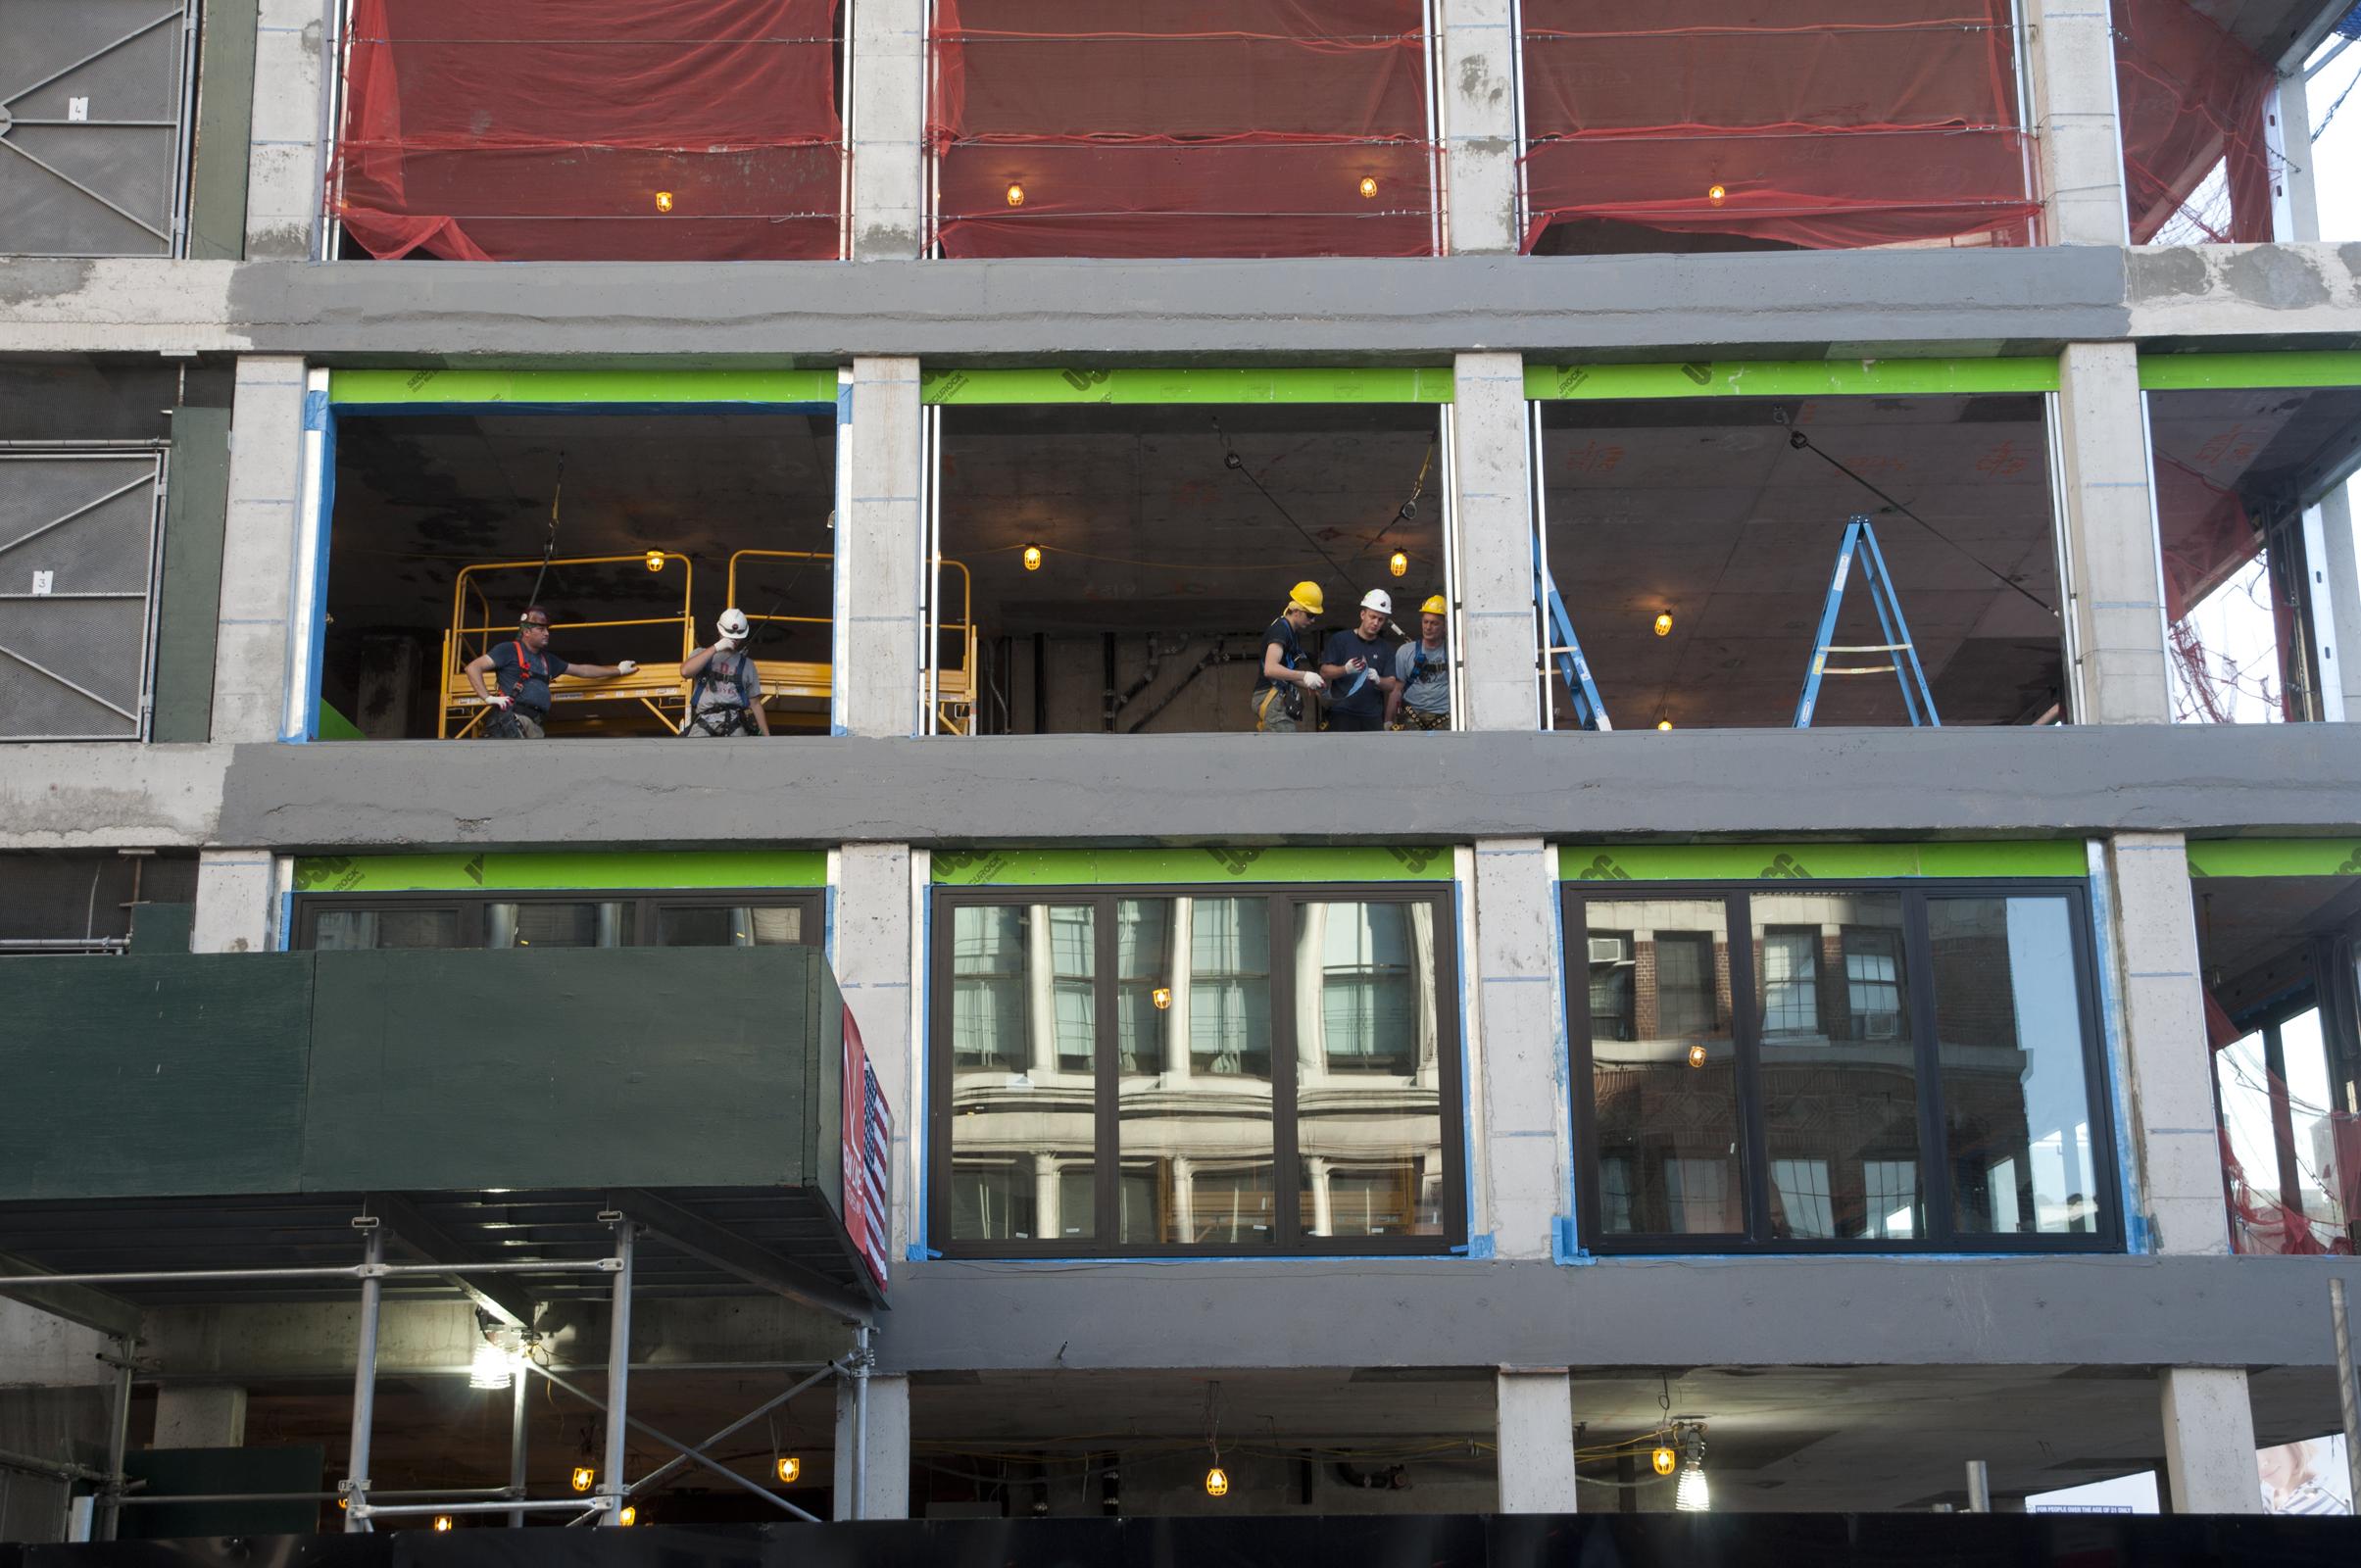 Window units on the second floor of the Bond Street facade.